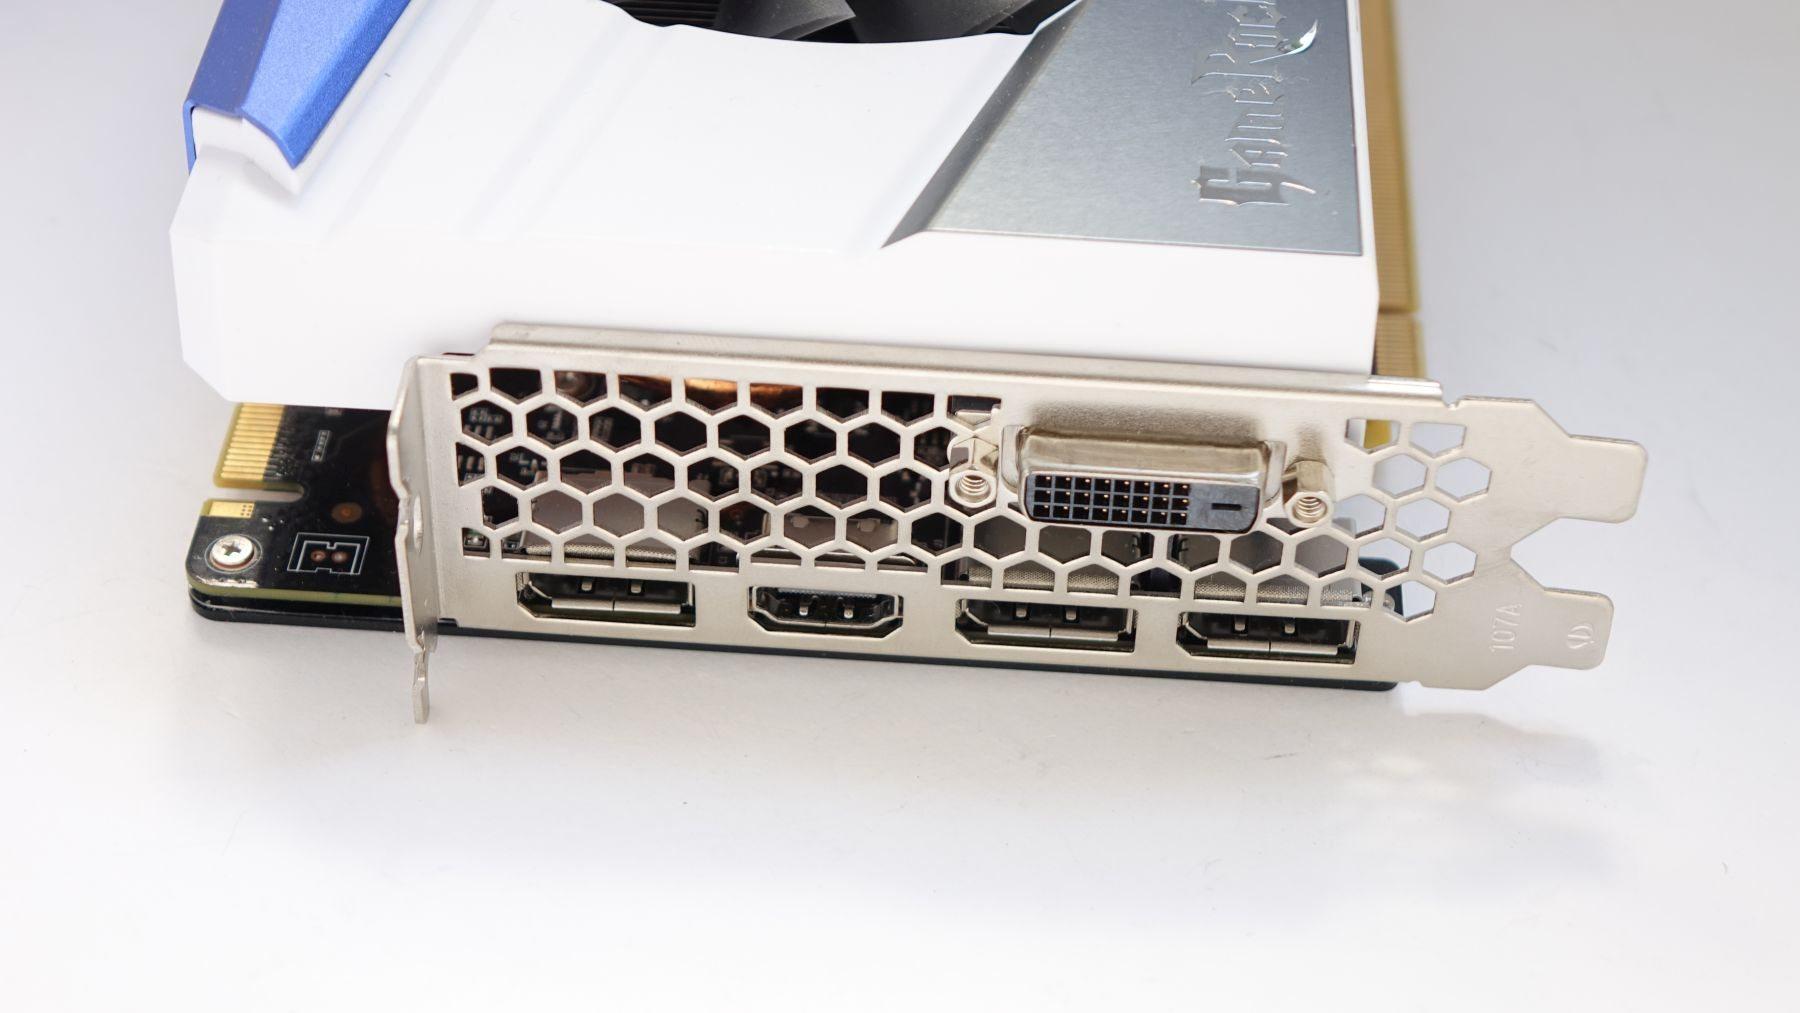 Palit GeForce GTX 1080 GameRock Premium Edition ports